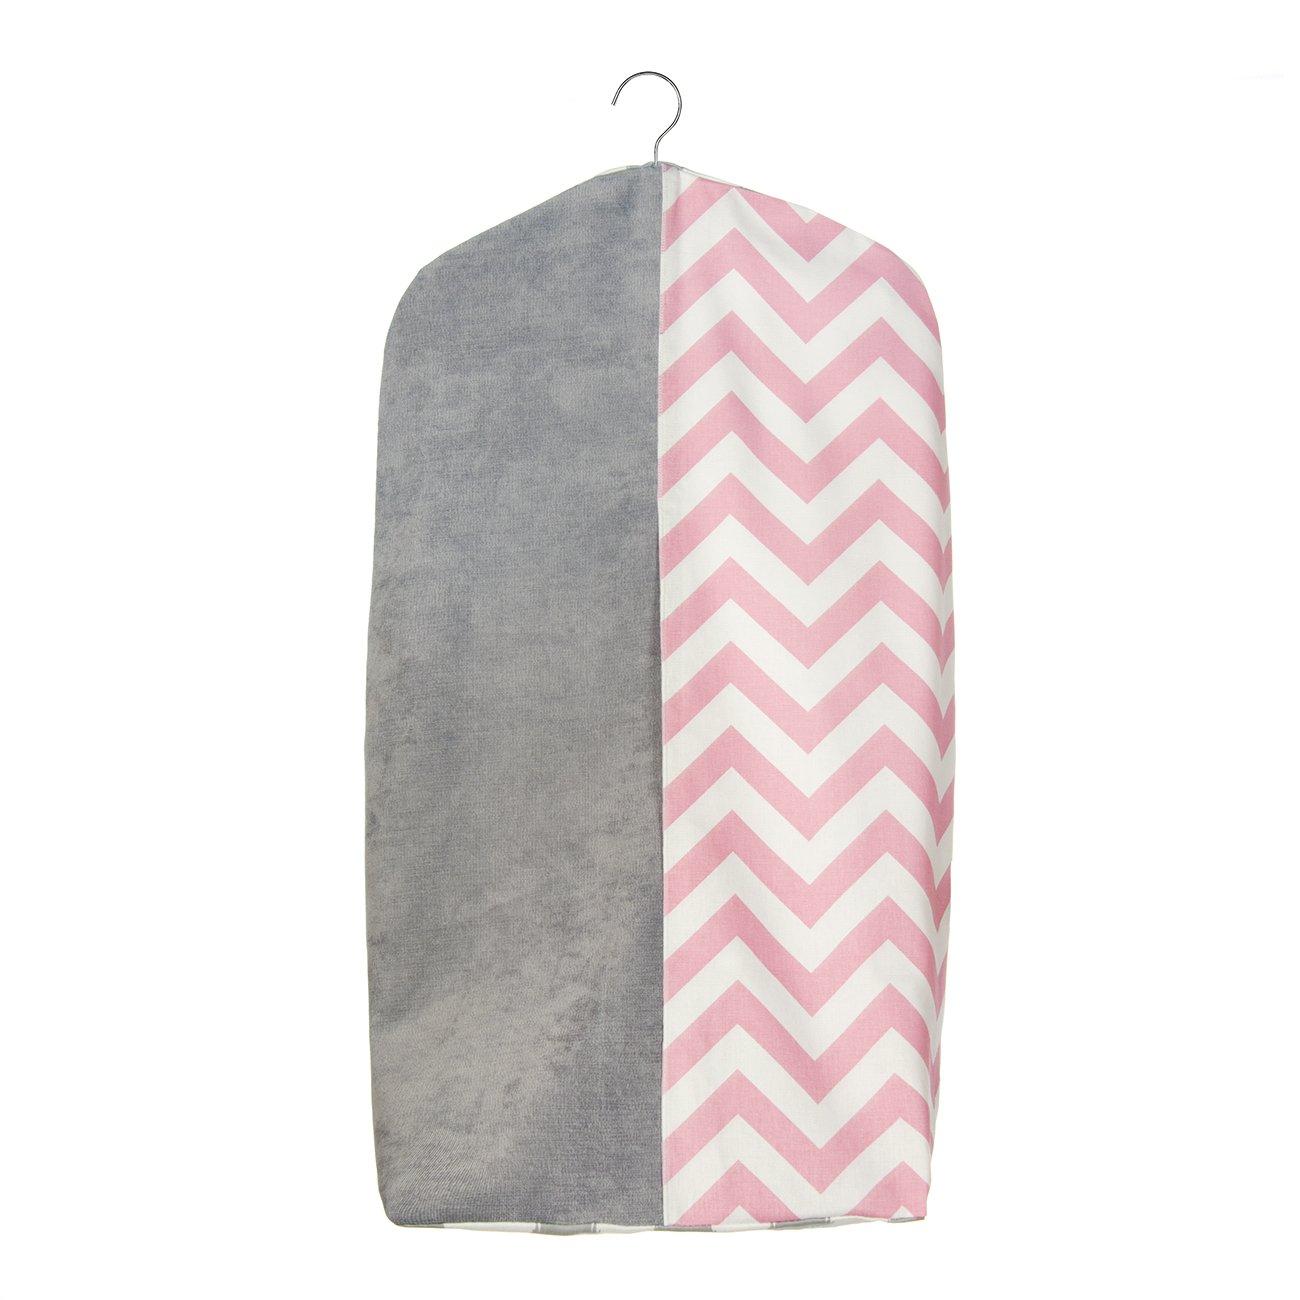 Sweet Potato Swizzle Diaper Stacker, Pink/Grey/White by Sweet Potatoes